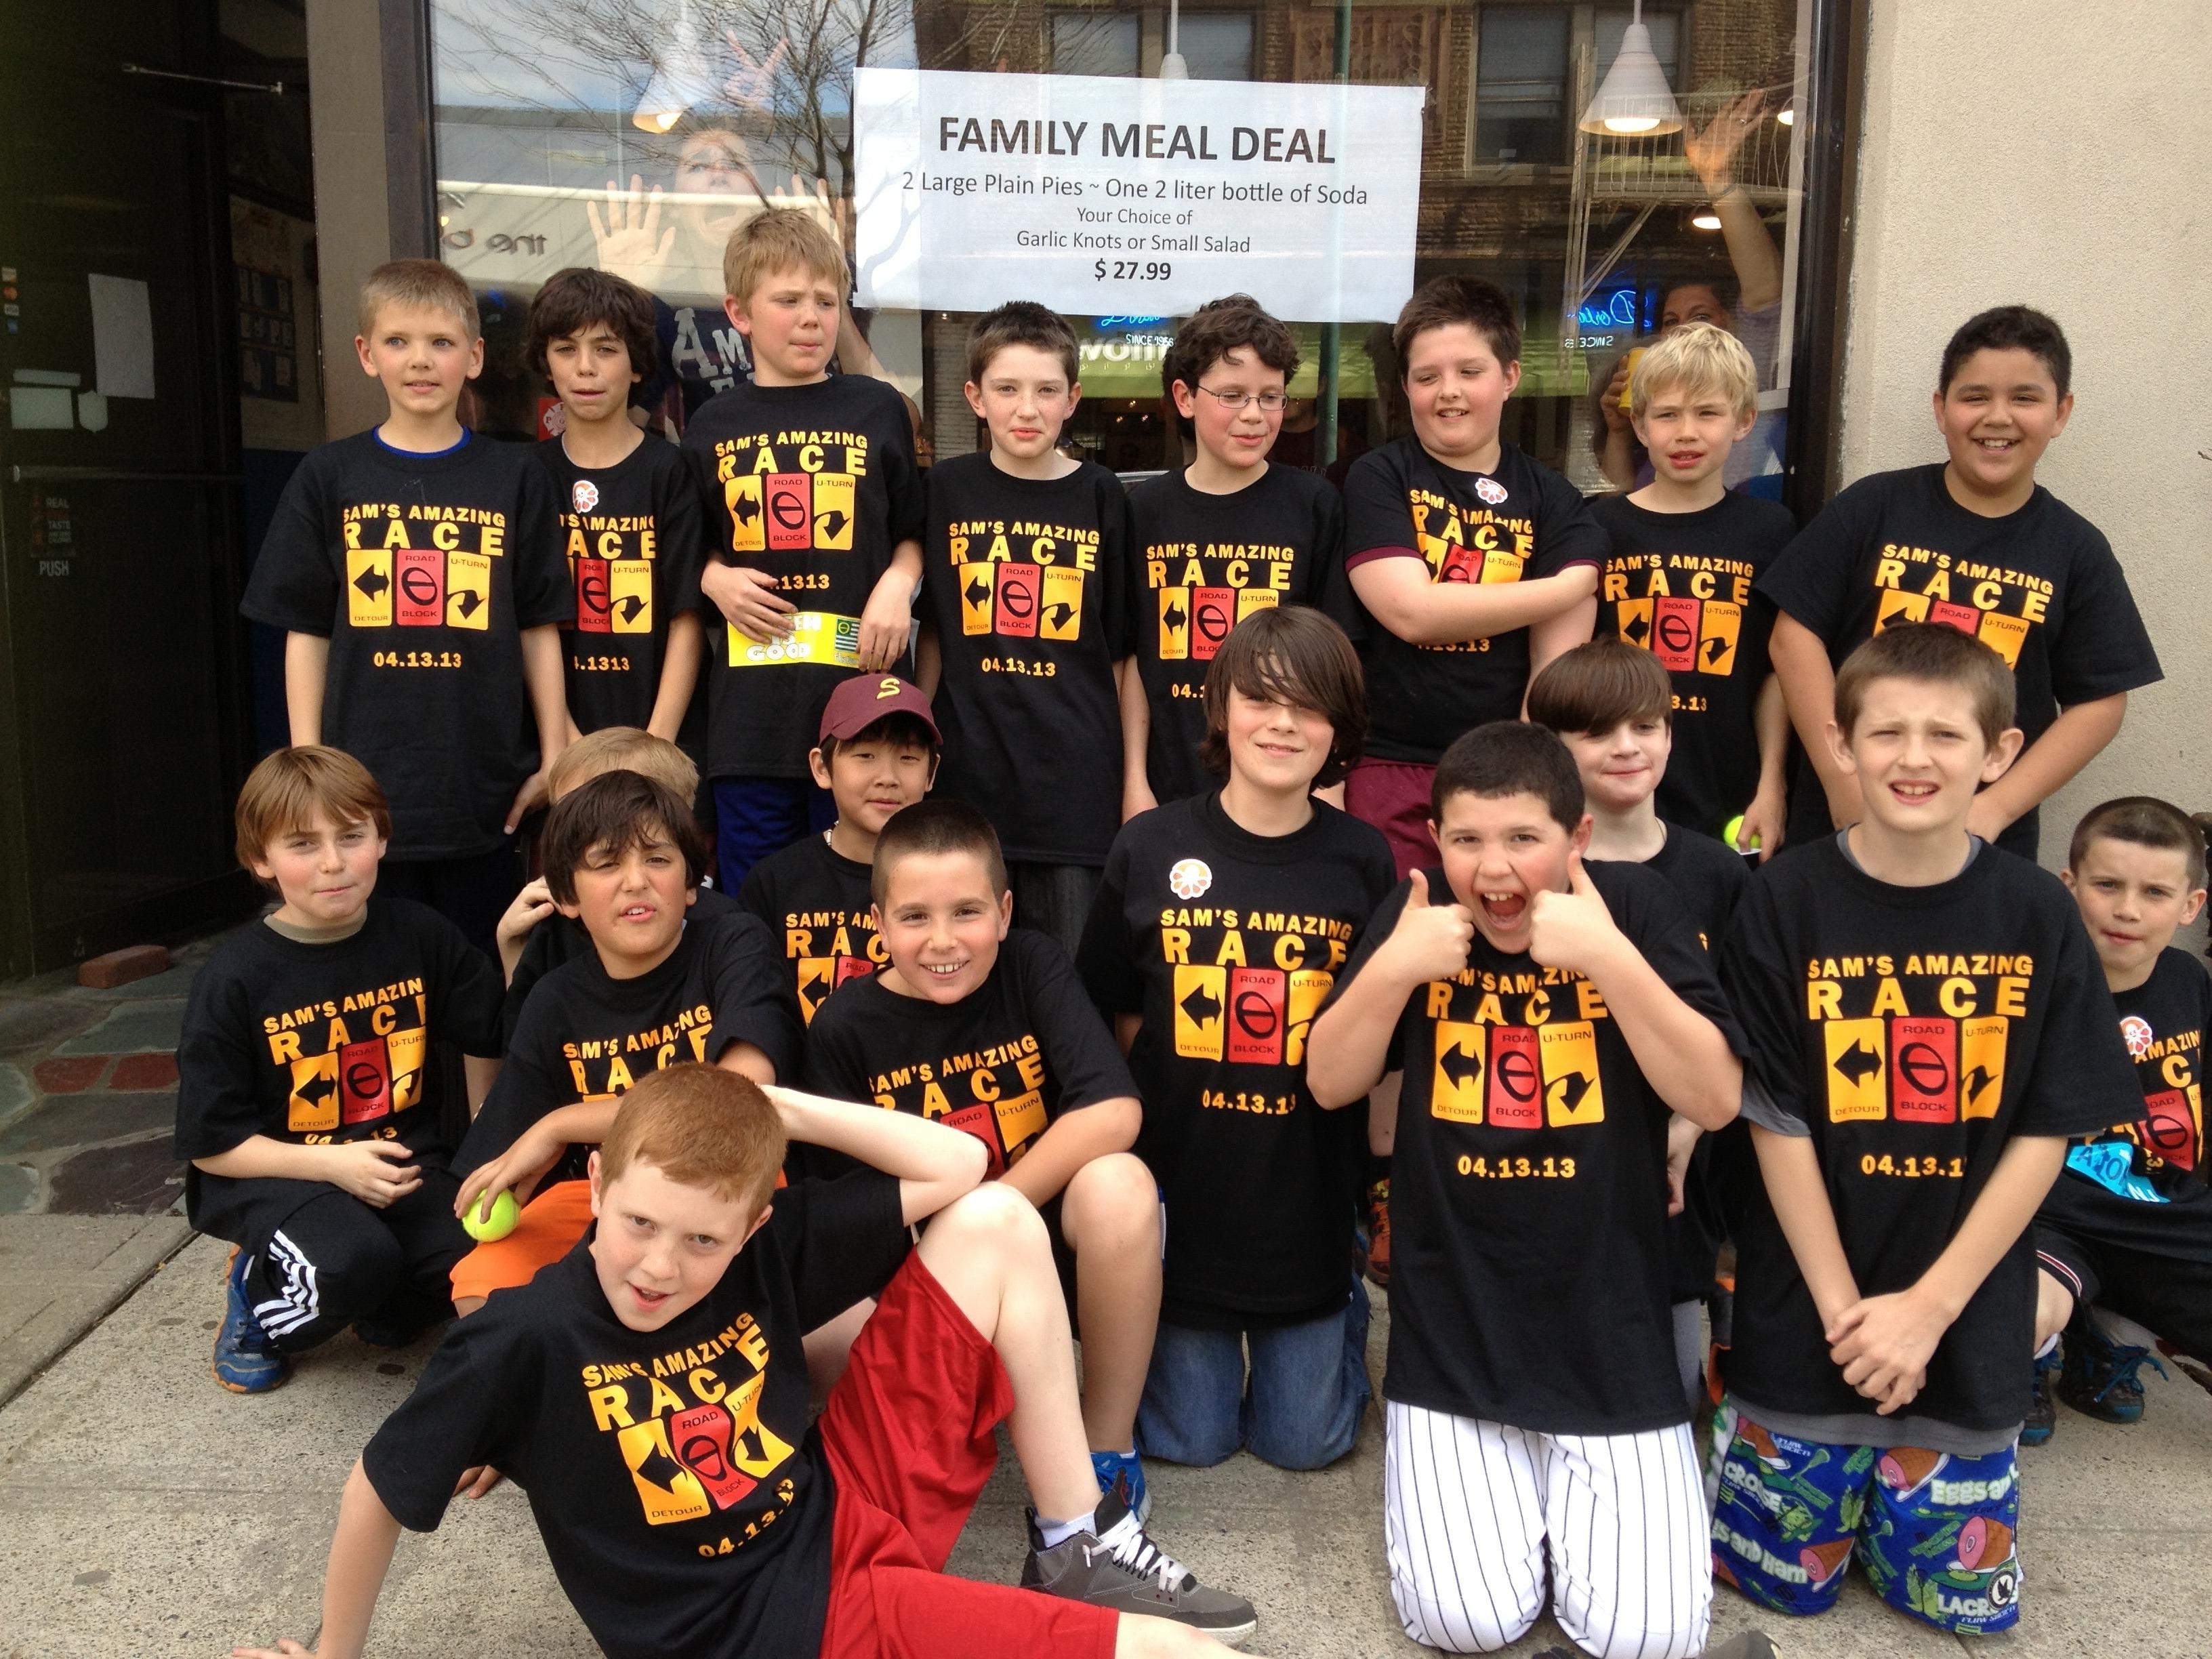 Custom T Shirts For Sams Amazing Race Shirt Design Ideas